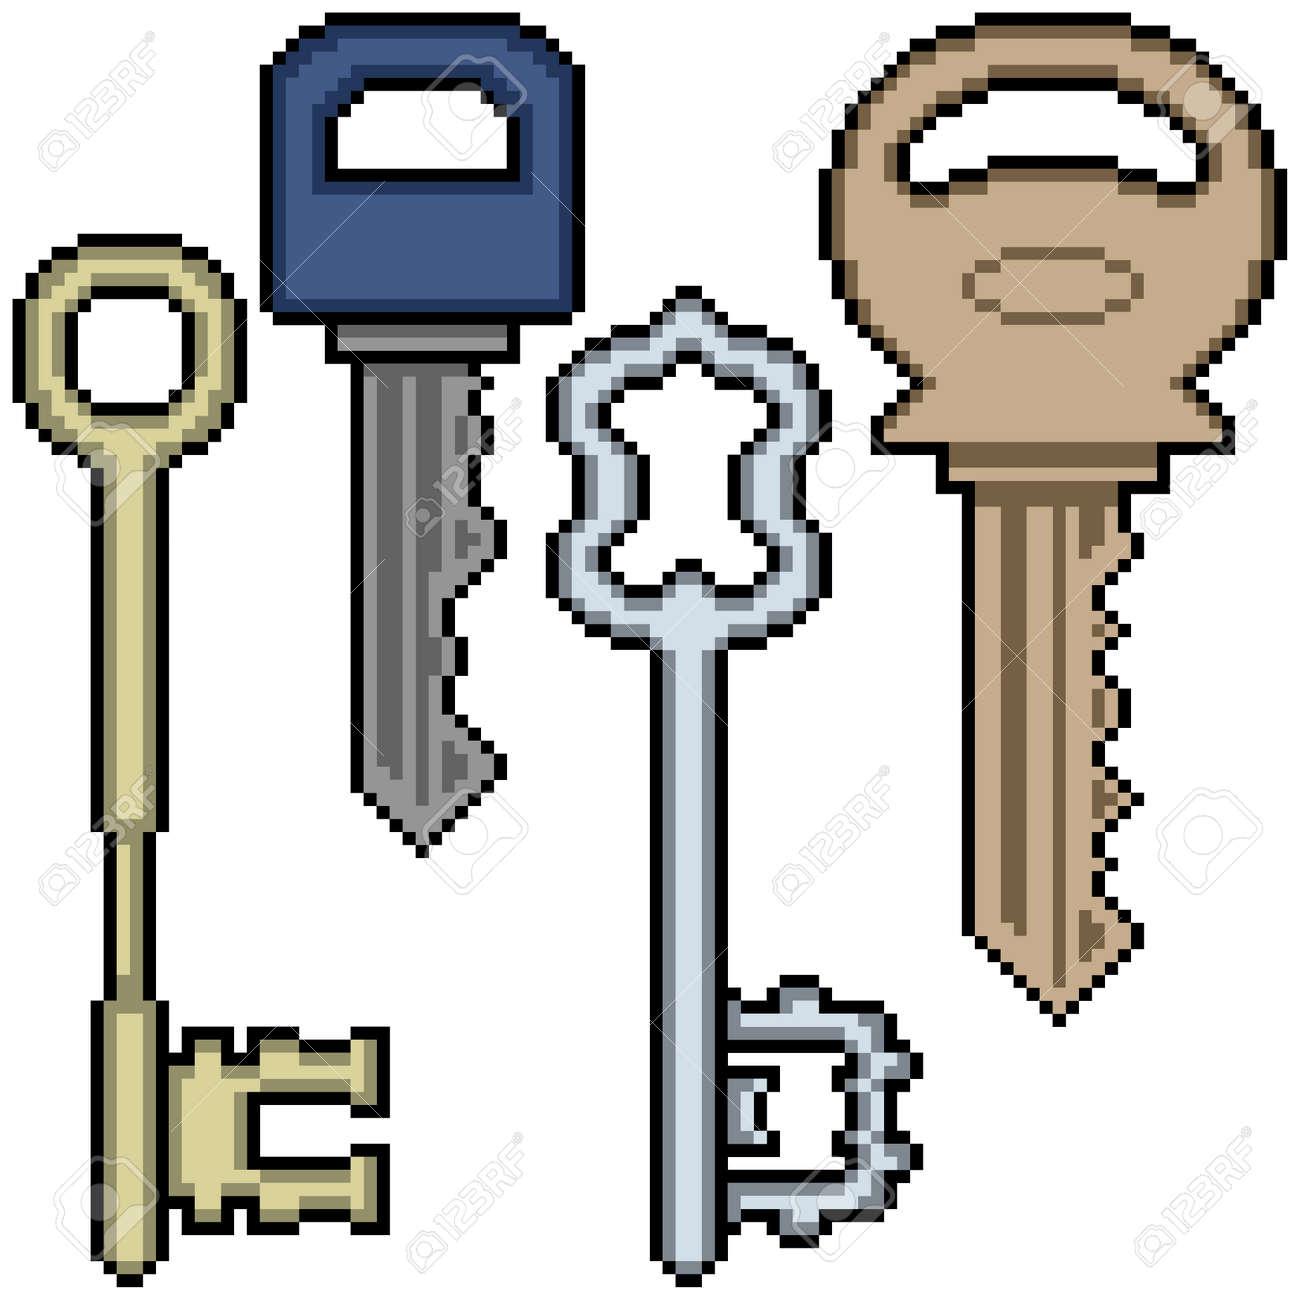 pixel art of various key - 169836185